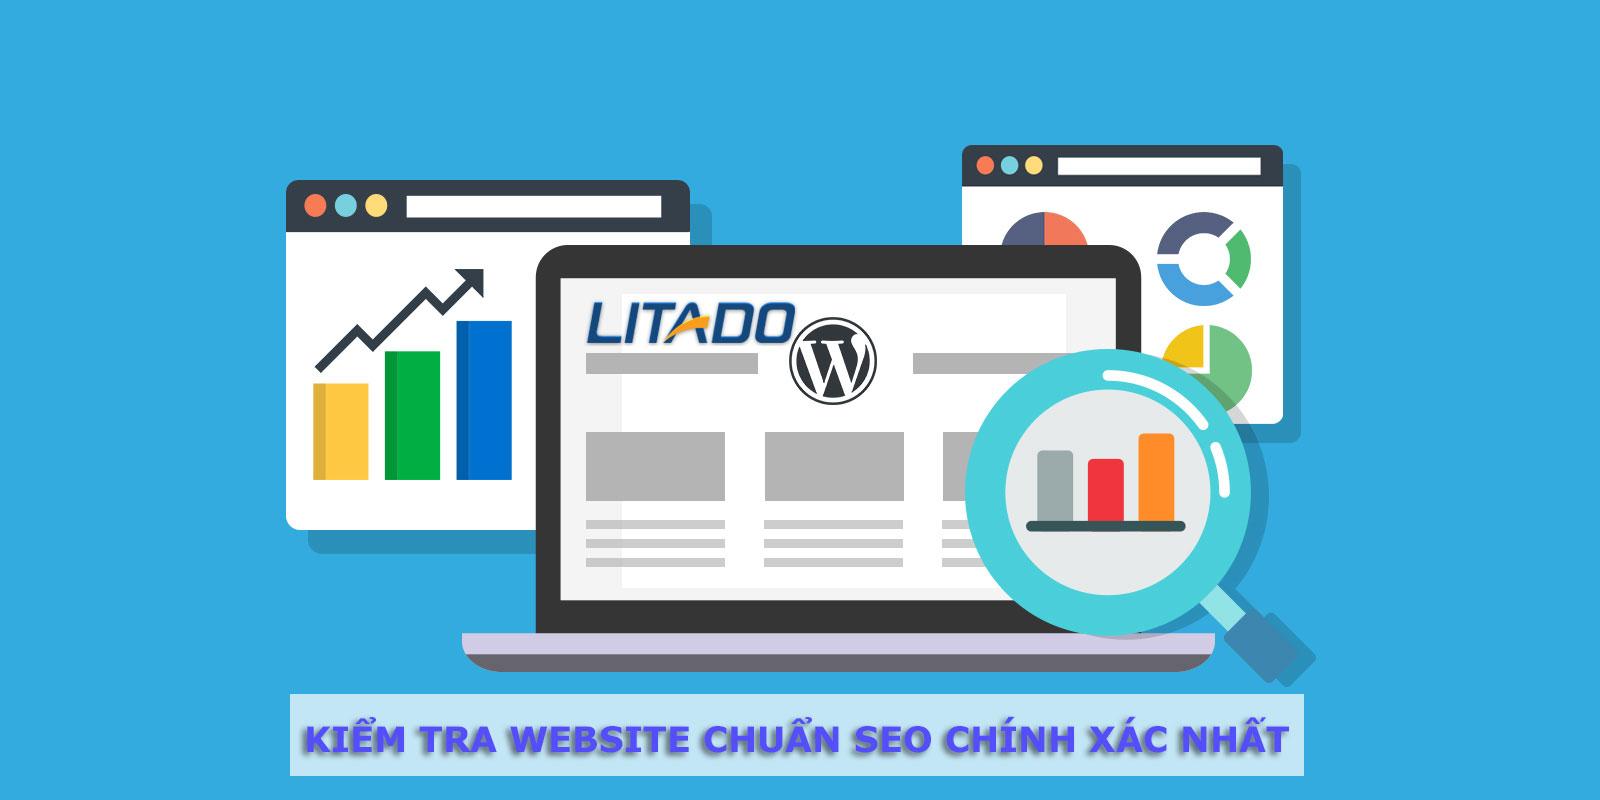 kiểm tra website chuẩn SEO